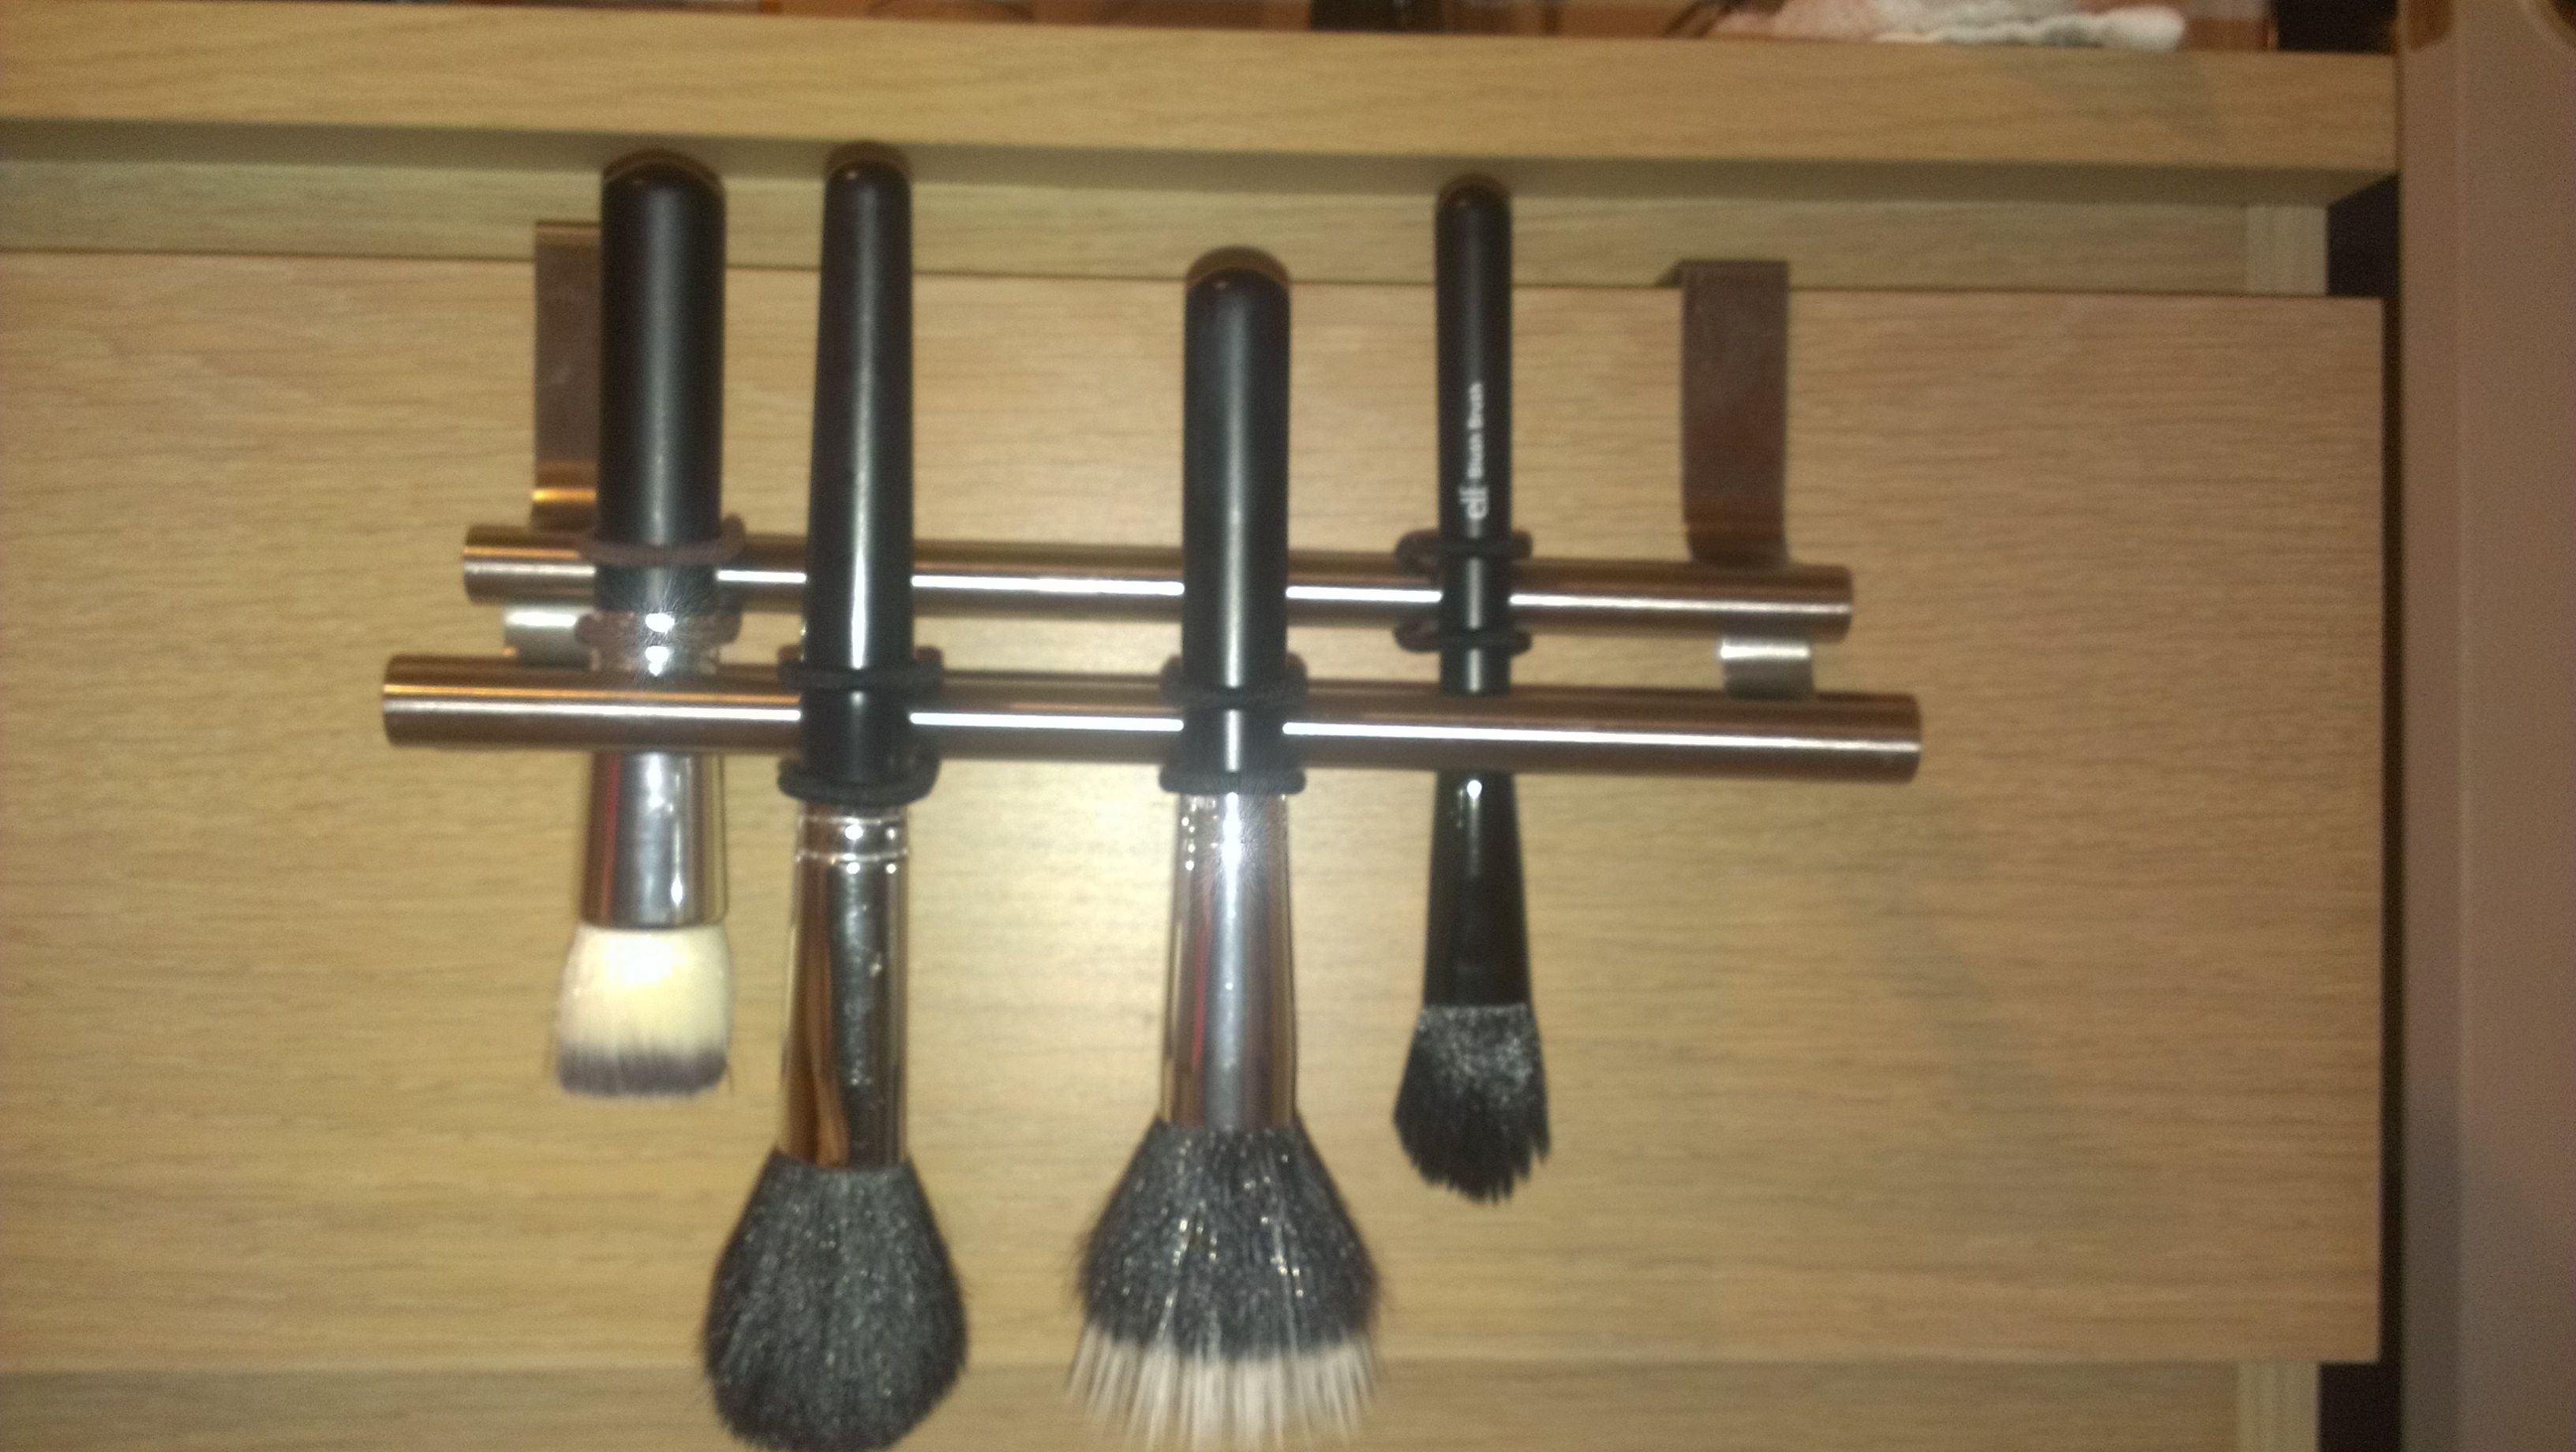 diy makeup brush drying rack Diy makeup brush, Diy